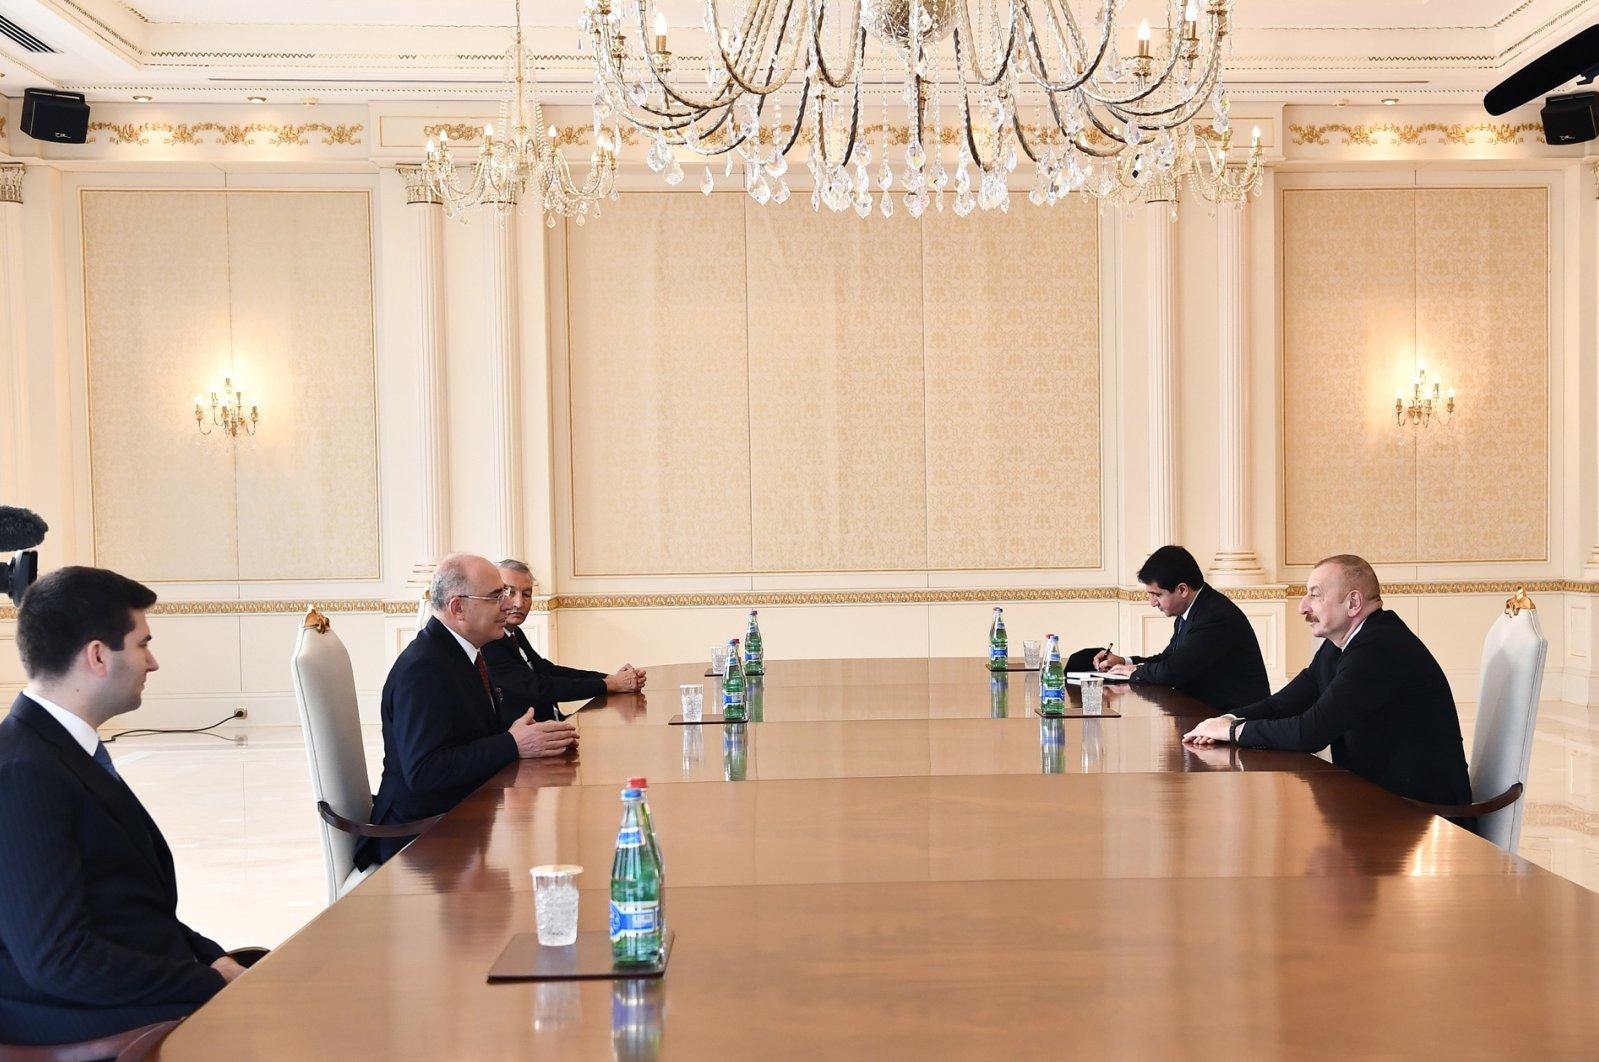 Azerbaijan's President Ilham Aliyev (R) receives a Nationalist Movement Party (MHP) delegation in the capital Baku, Azerbaijan, Feb. 2, 2021. (AA Photo)